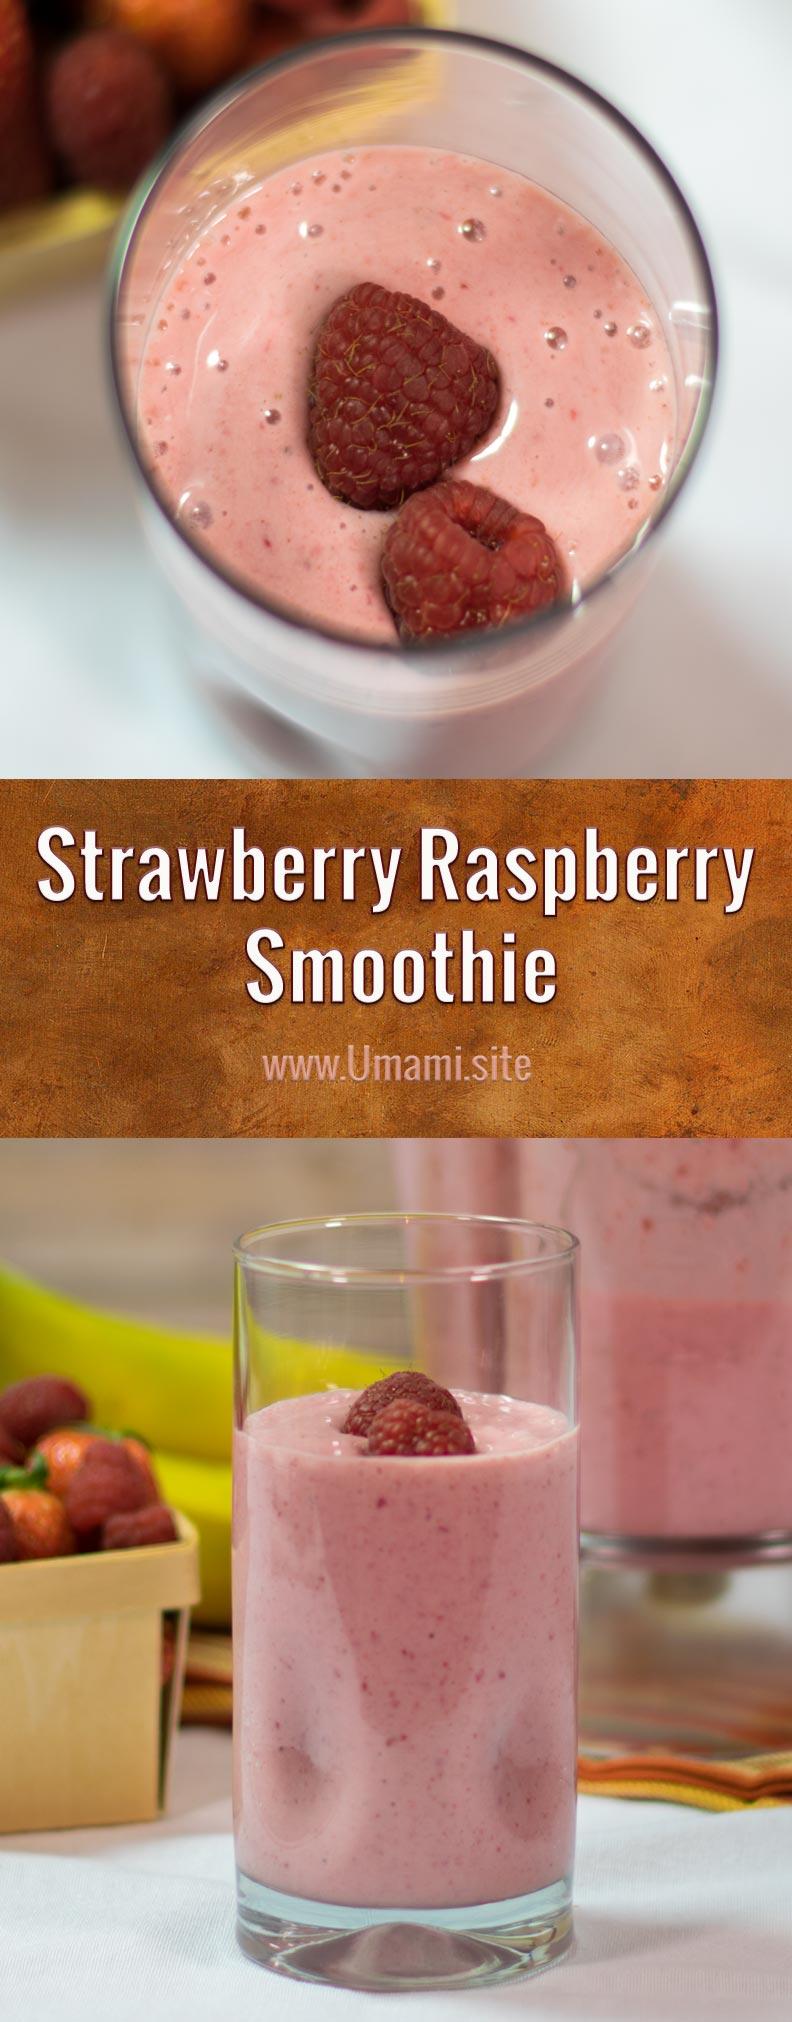 Strawberry Raspberry Smoothie Pinterest